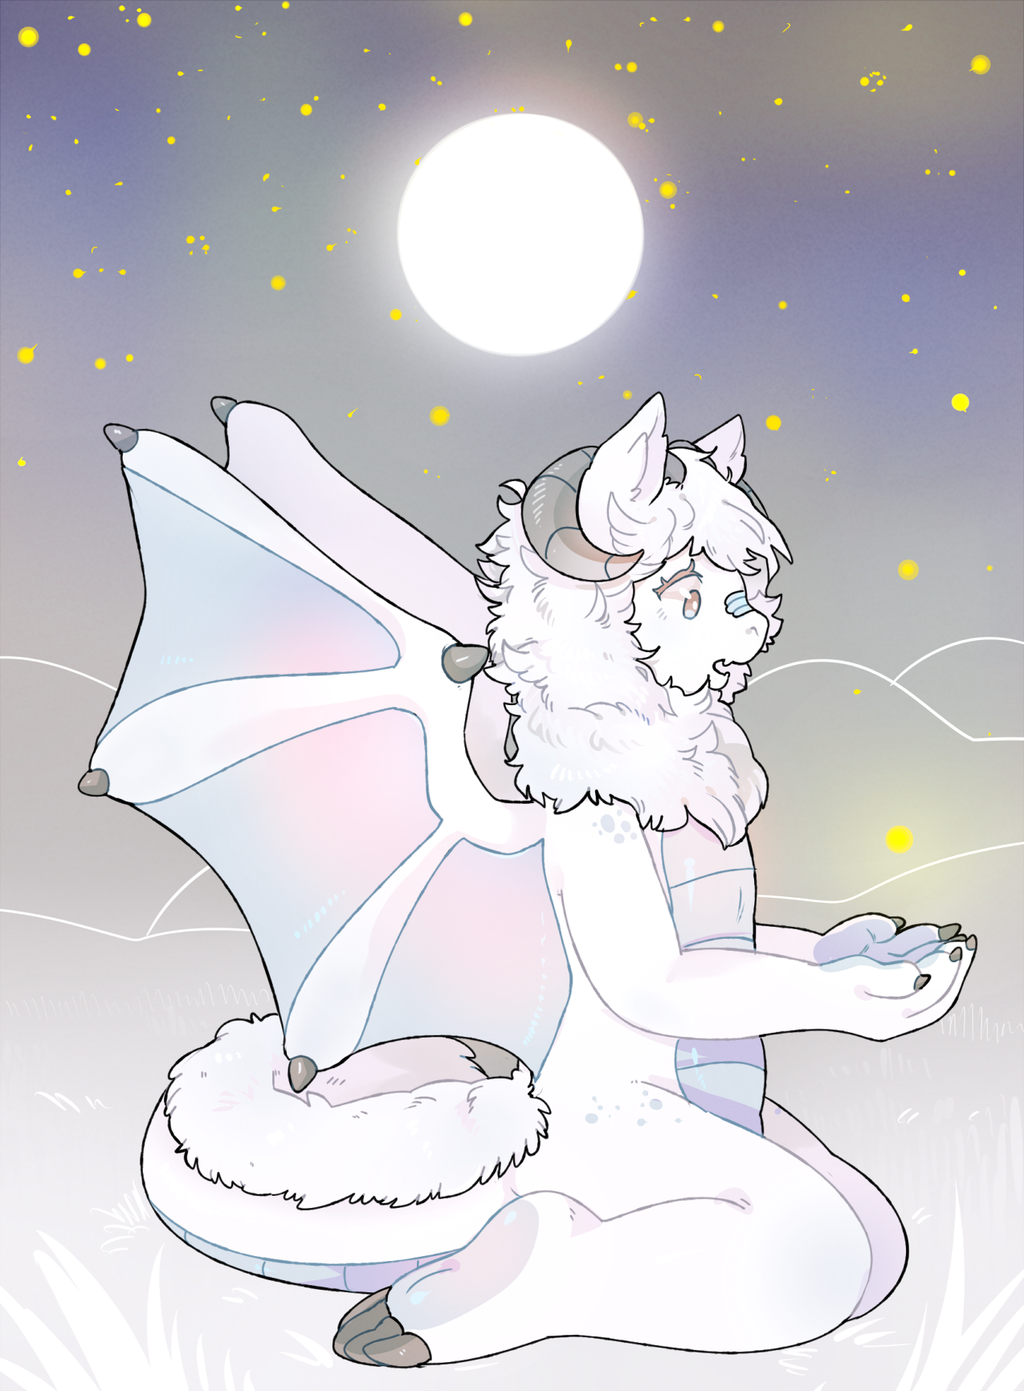 beneath the starry sky